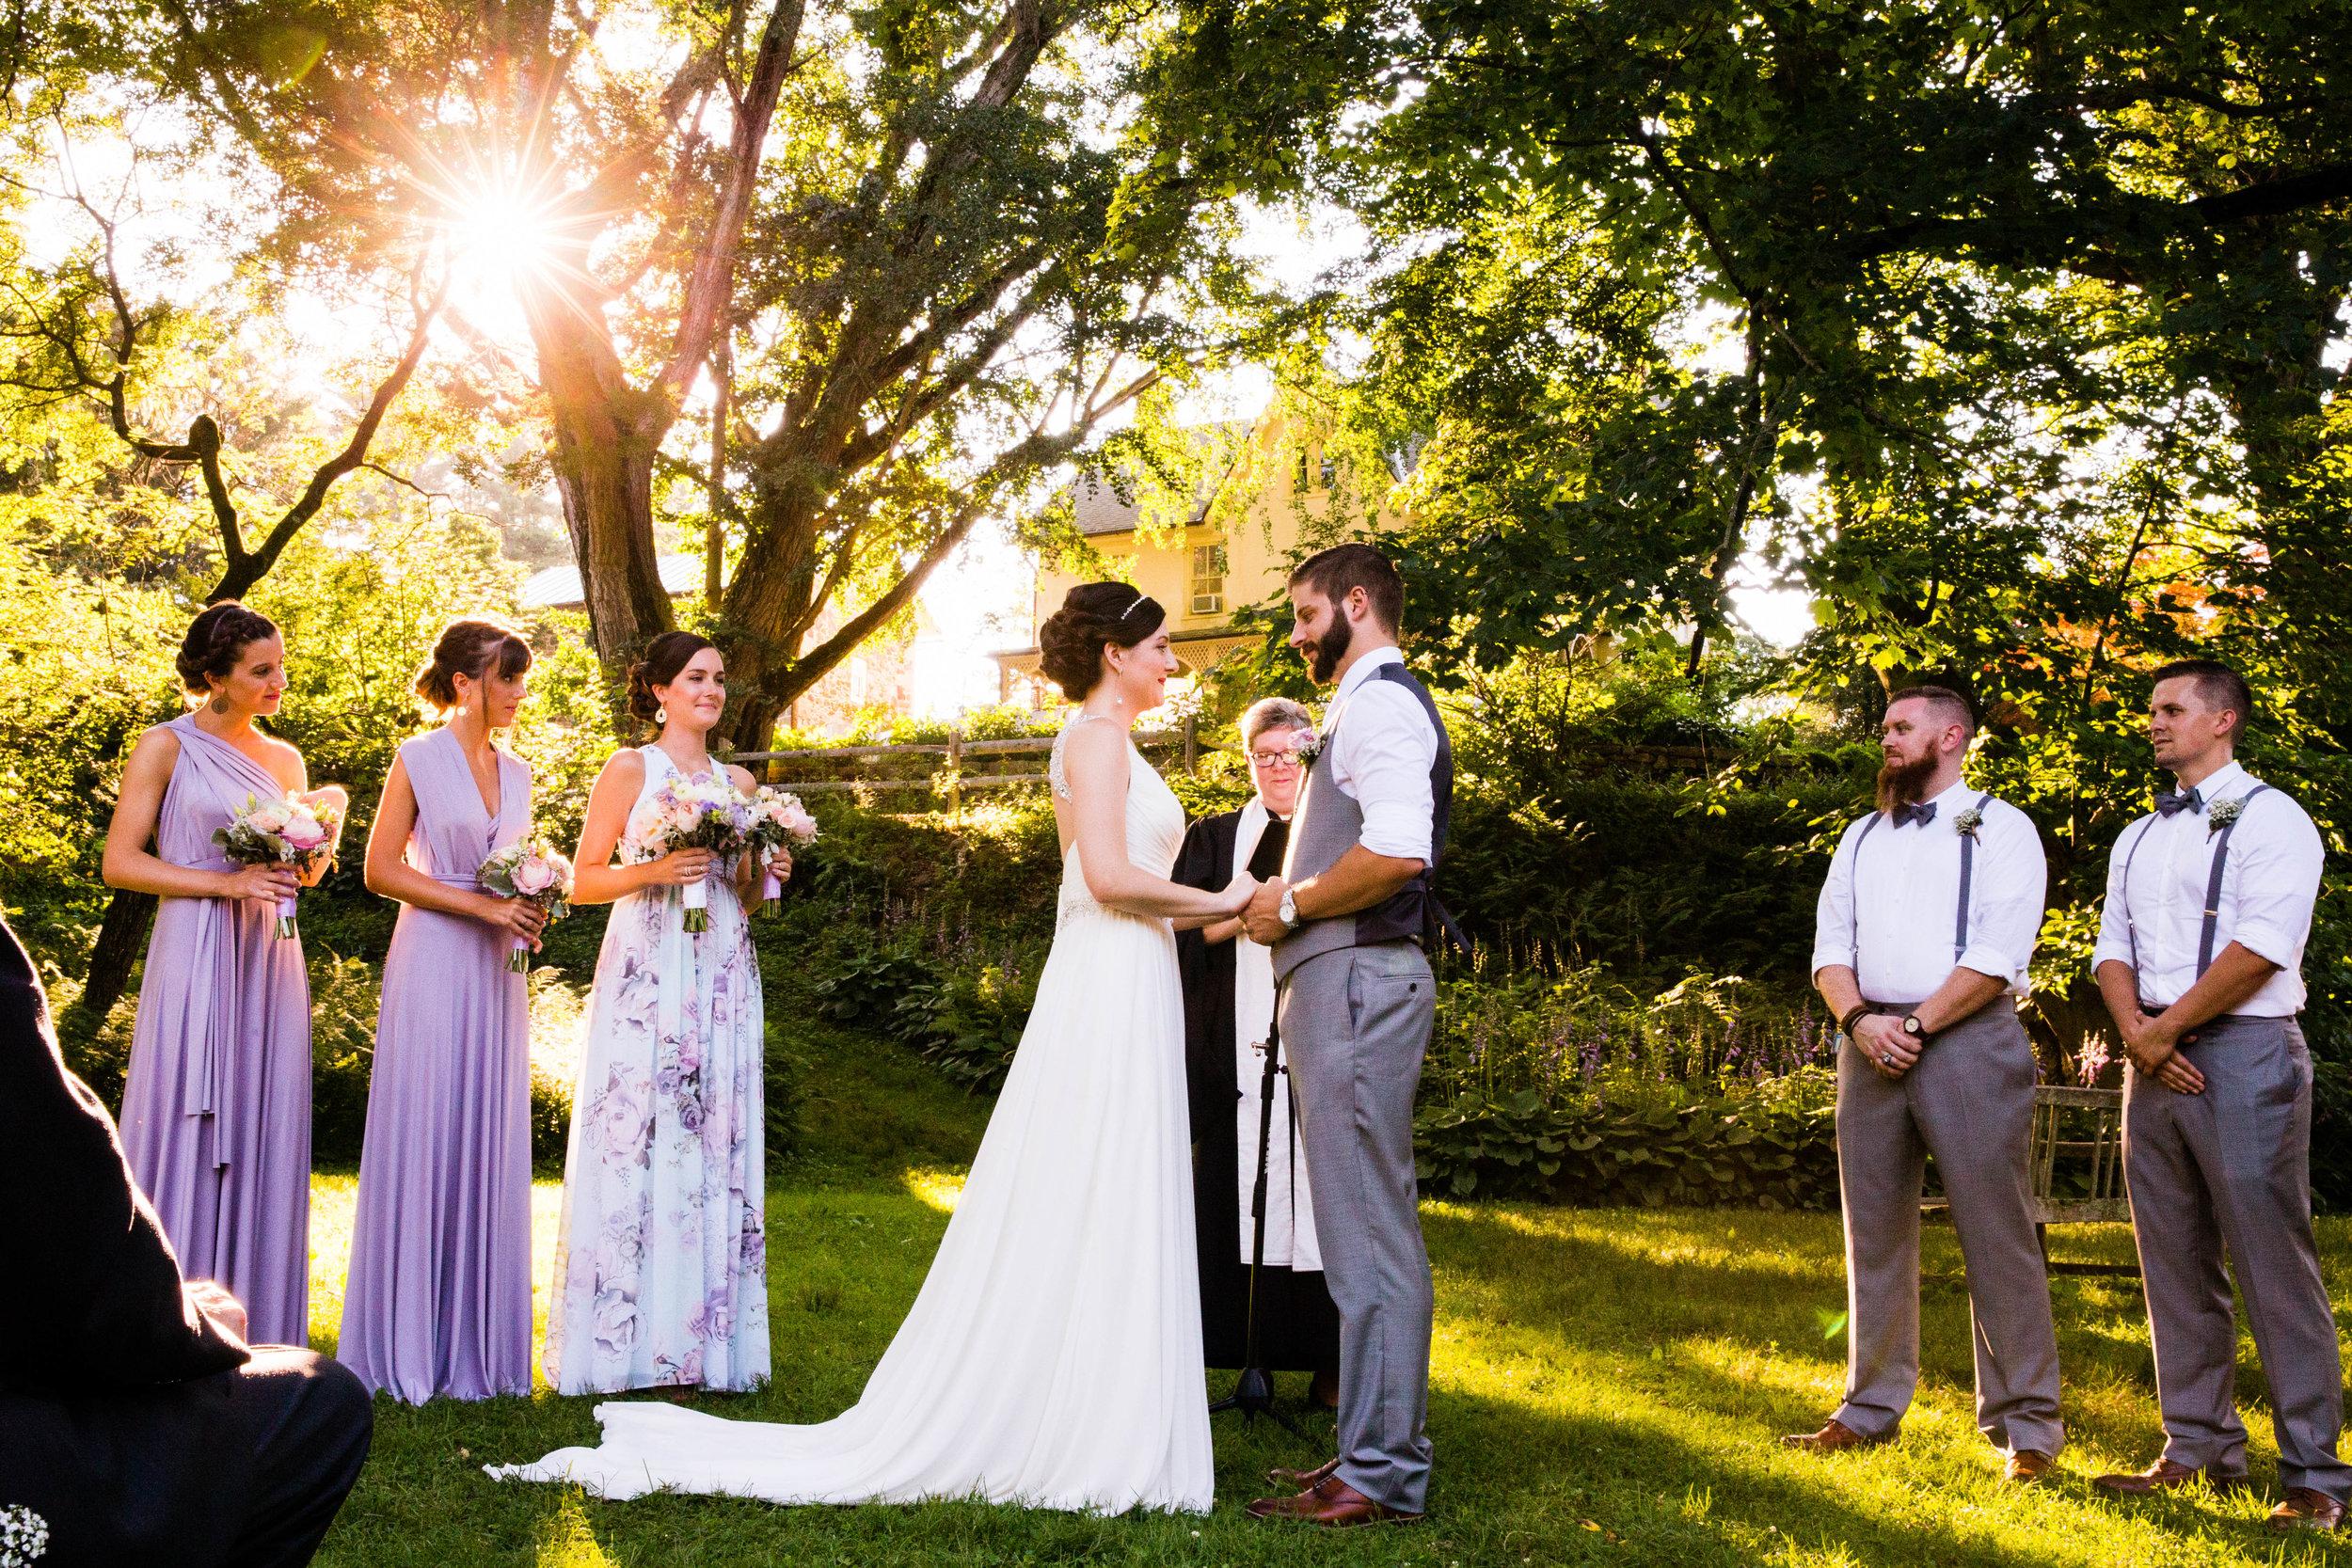 TYLER ARBORETUM WEDDING PHOTOGRAPHY LOVESTRUCK PICTURES-059.jpg